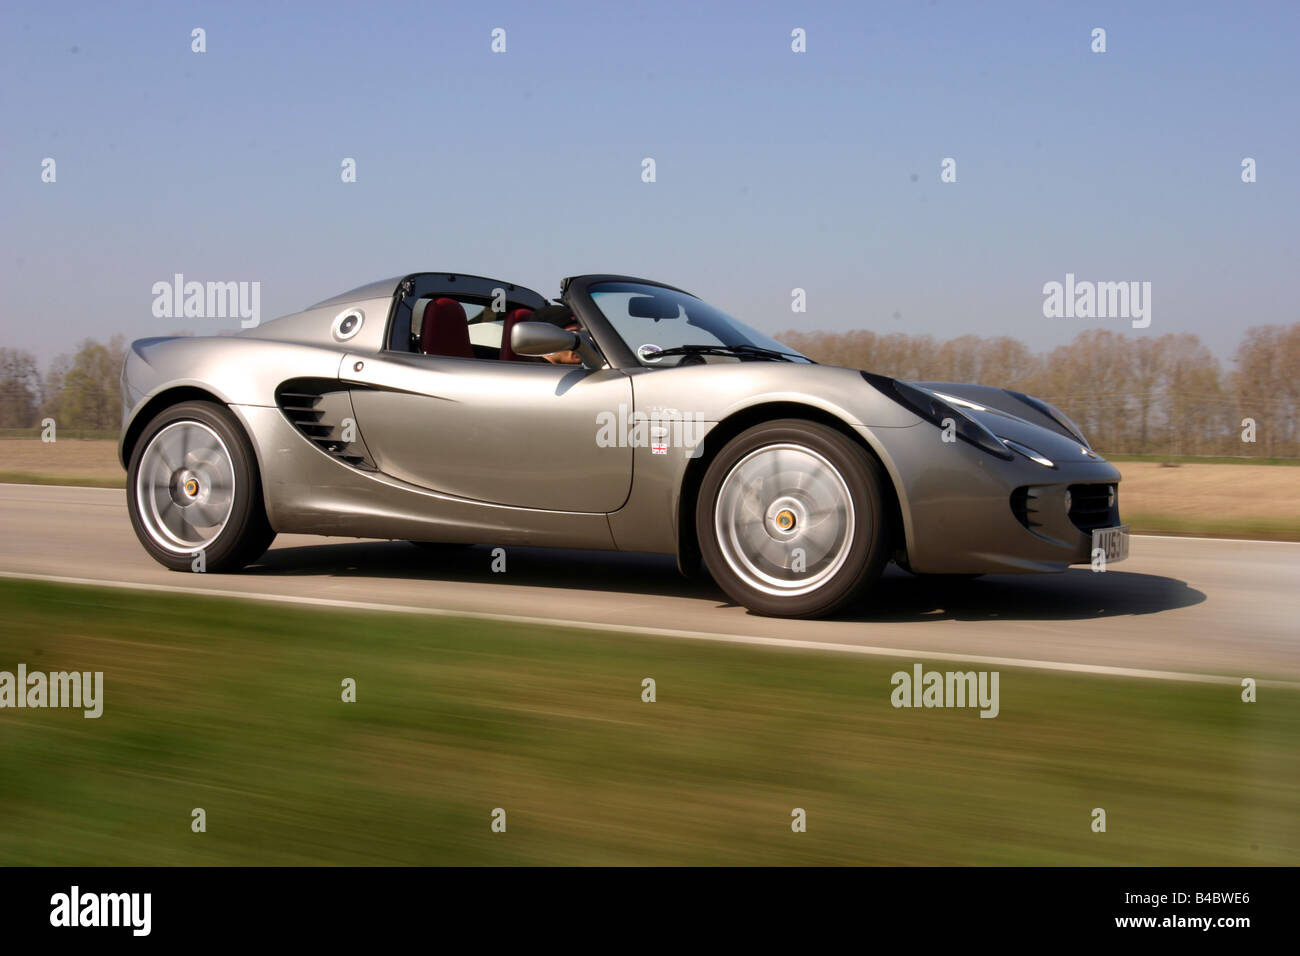 http://c8.alamy.com/comp/B4BWE6/car-lotus-elise-111-r-convertible-model-year-2004-open-top-driving-B4BWE6.jpg